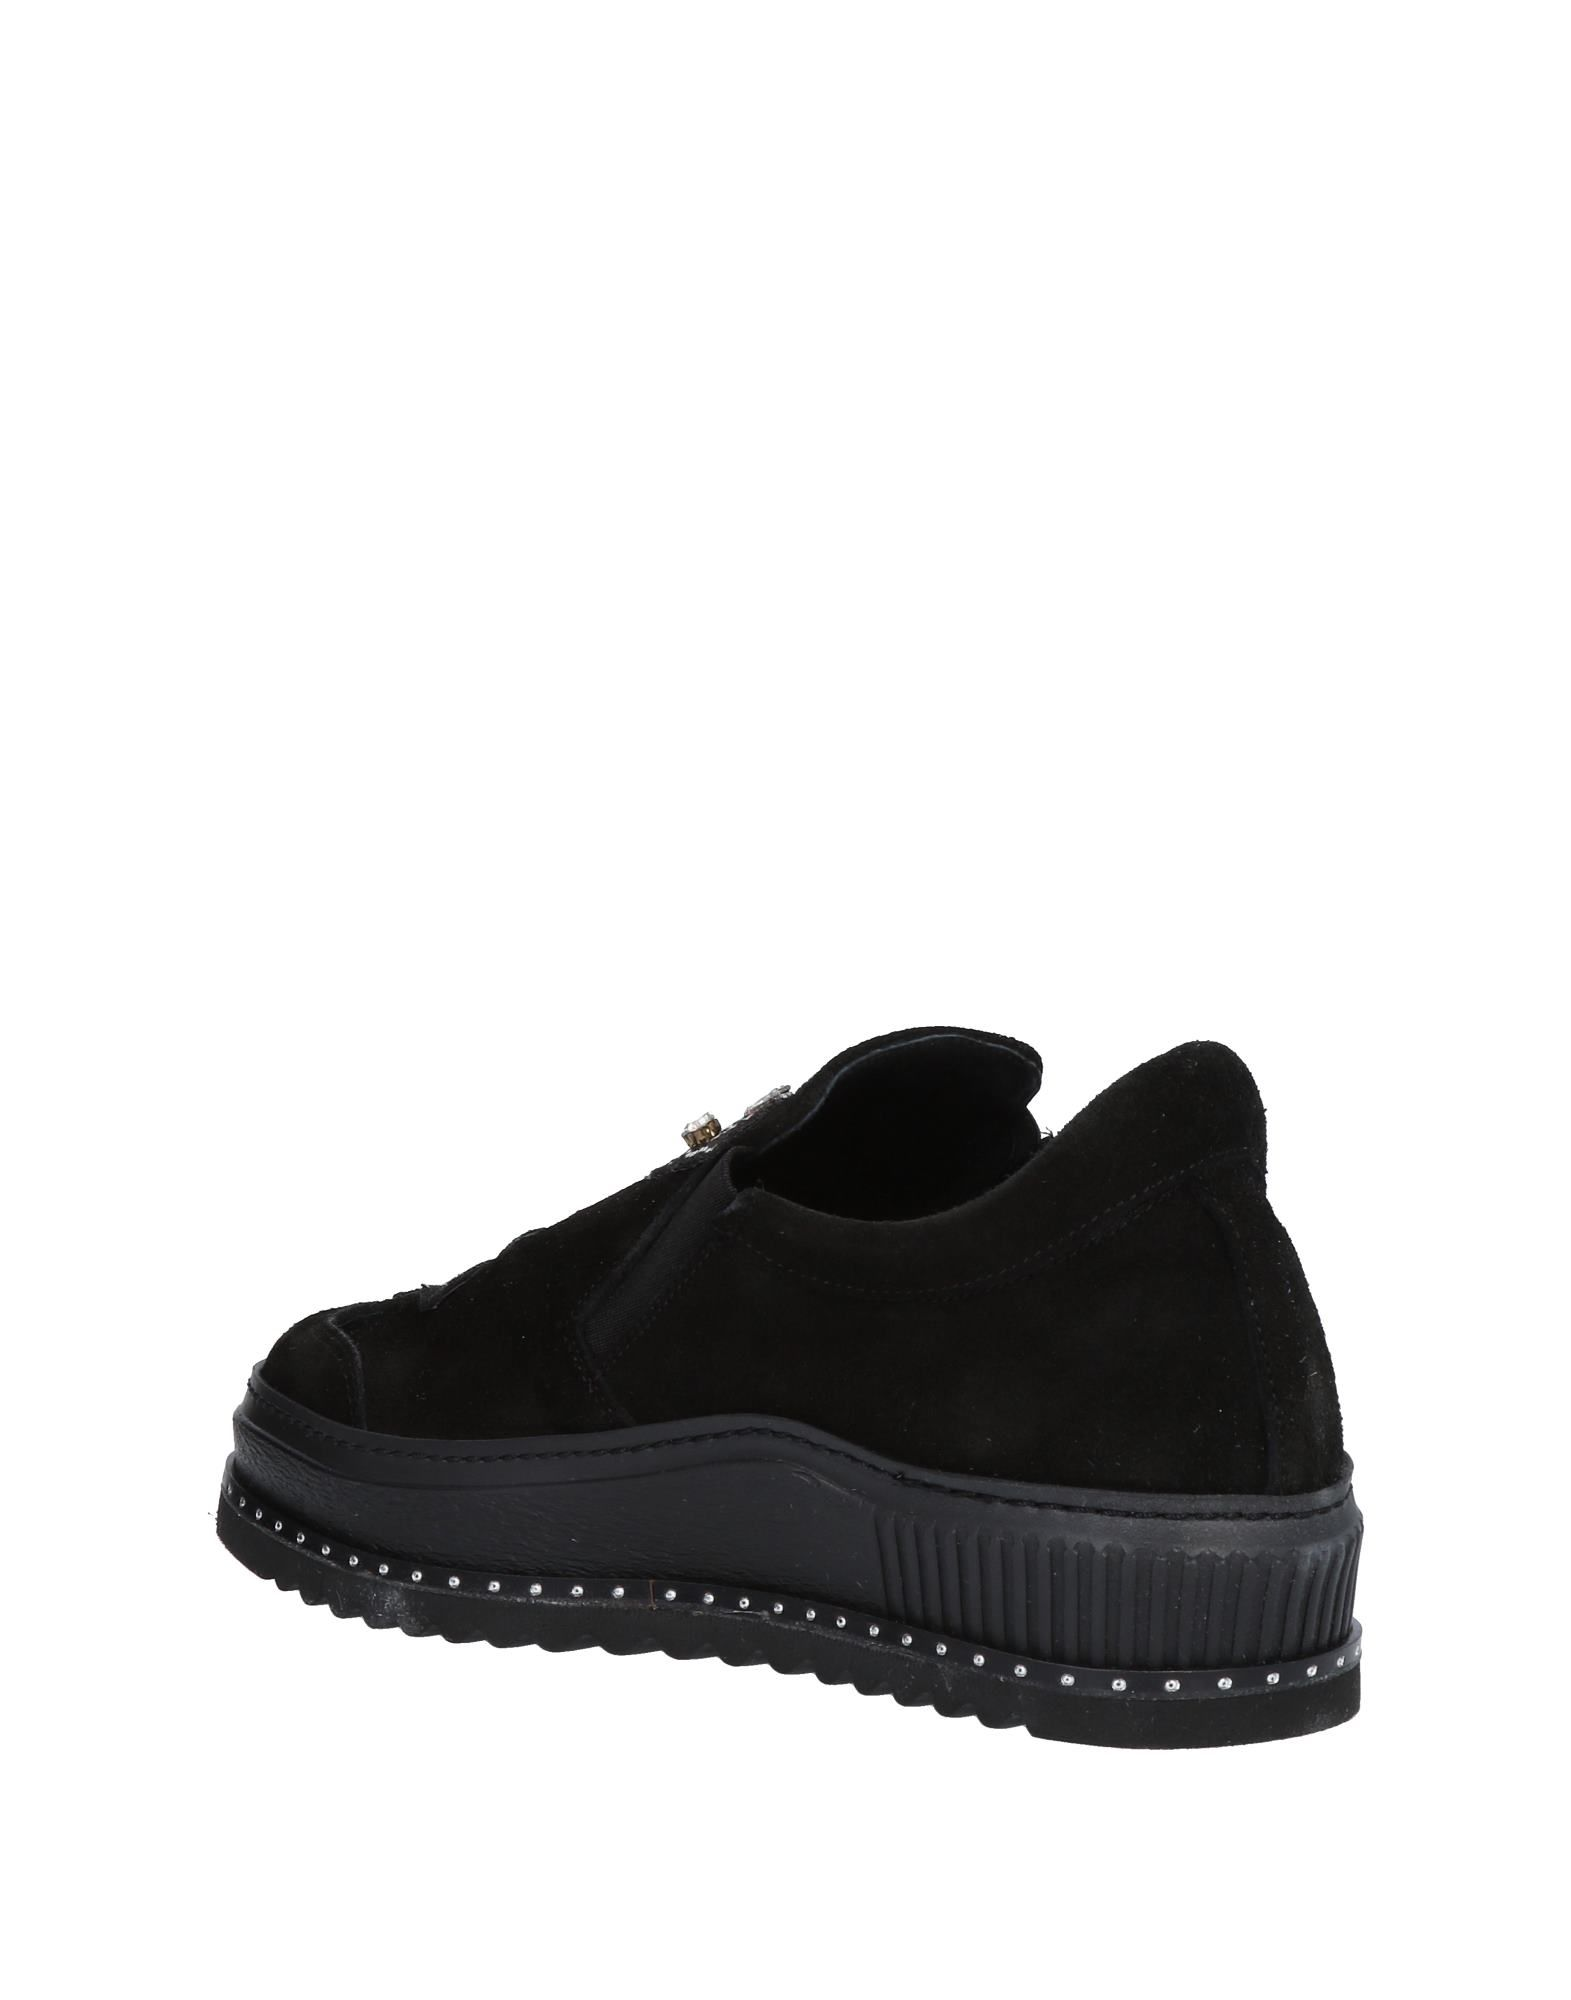 Nila & Nila Qualität Sneakers Damen  11476749OT Gute Qualität Nila beliebte Schuhe 64e3fa